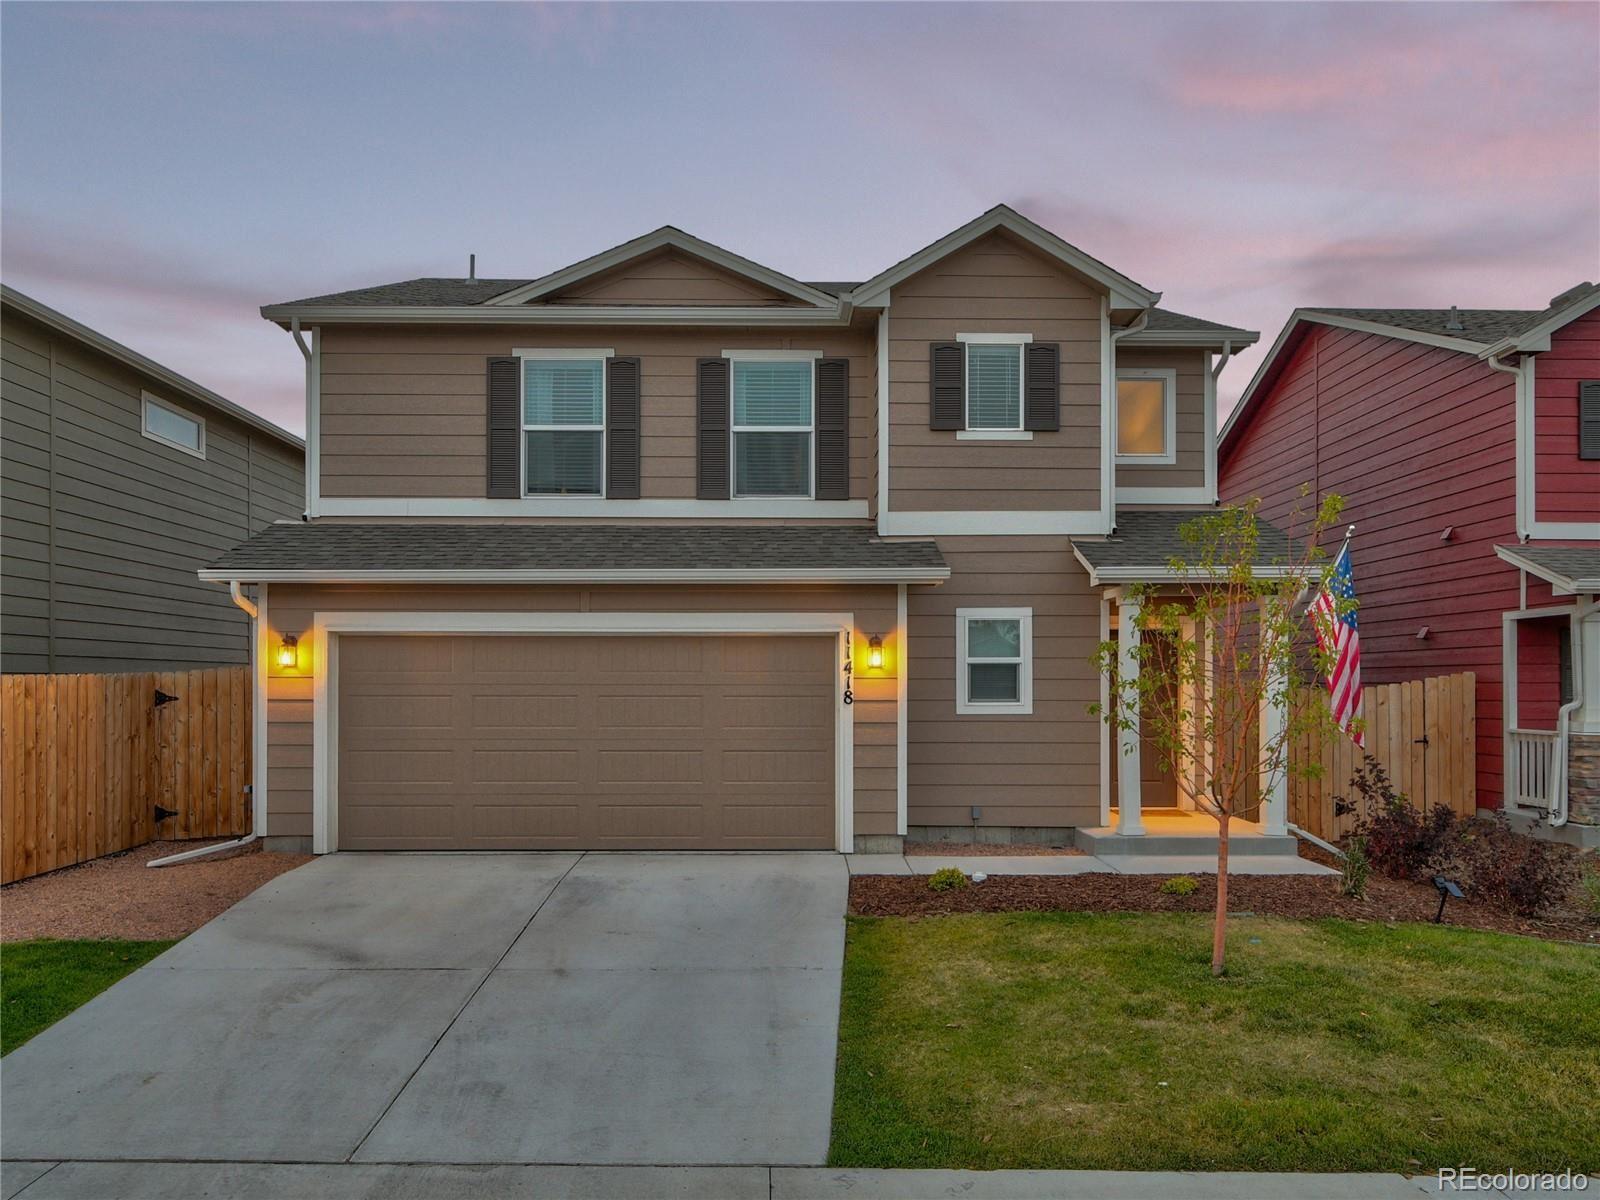 11418 Moonrock Heights, Peyton, CO 80831 - MLS#: 4876139